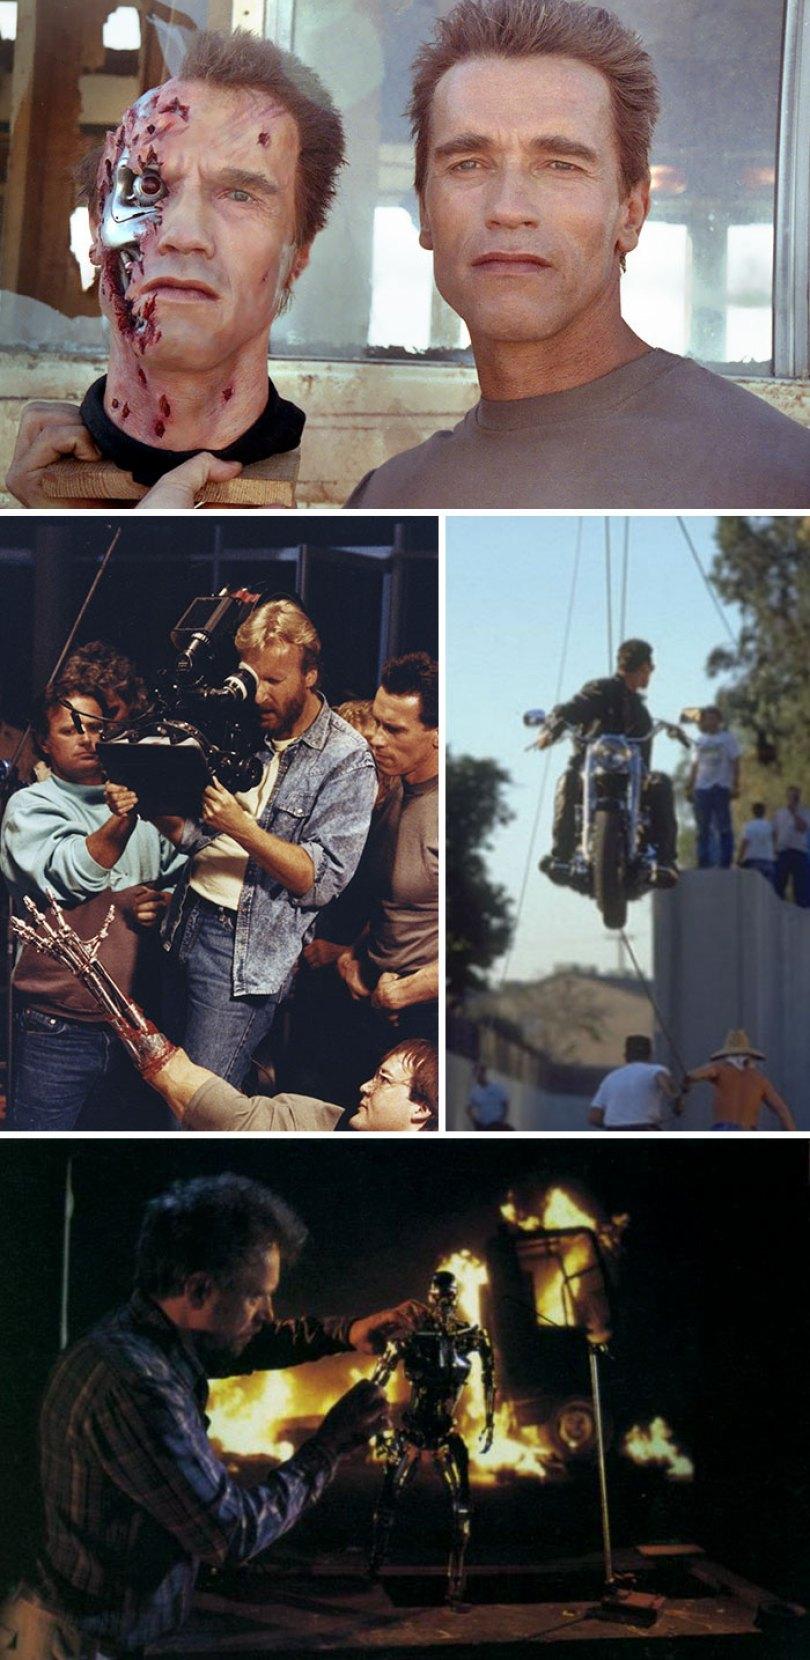 movies behind the scenes 133 5a69f3cce97a2  700 - Por trás das cenas: Foto dos bastidores de filmes que marcaram época